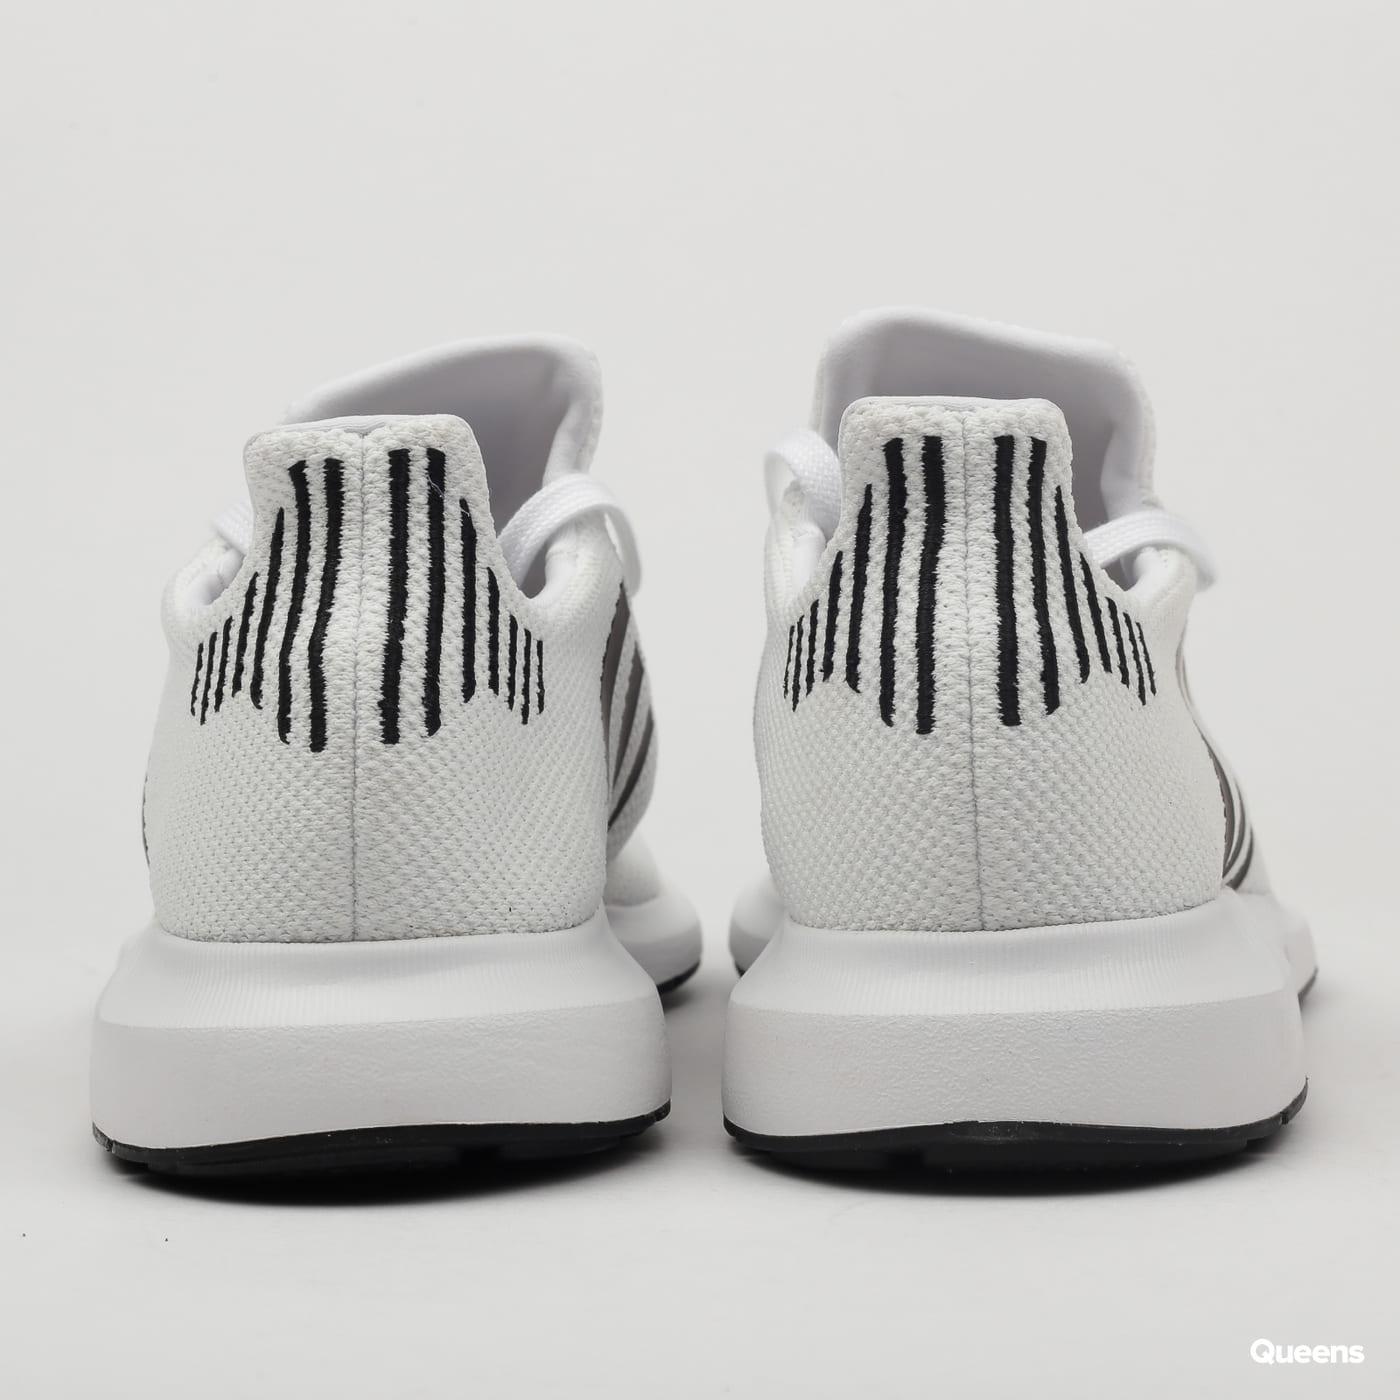 31a6084182f86 Zoom in Zoom in Zoom in Zoom in Zoom in. adidas Originals Swift Run ftwwht    cblack   mgreyh